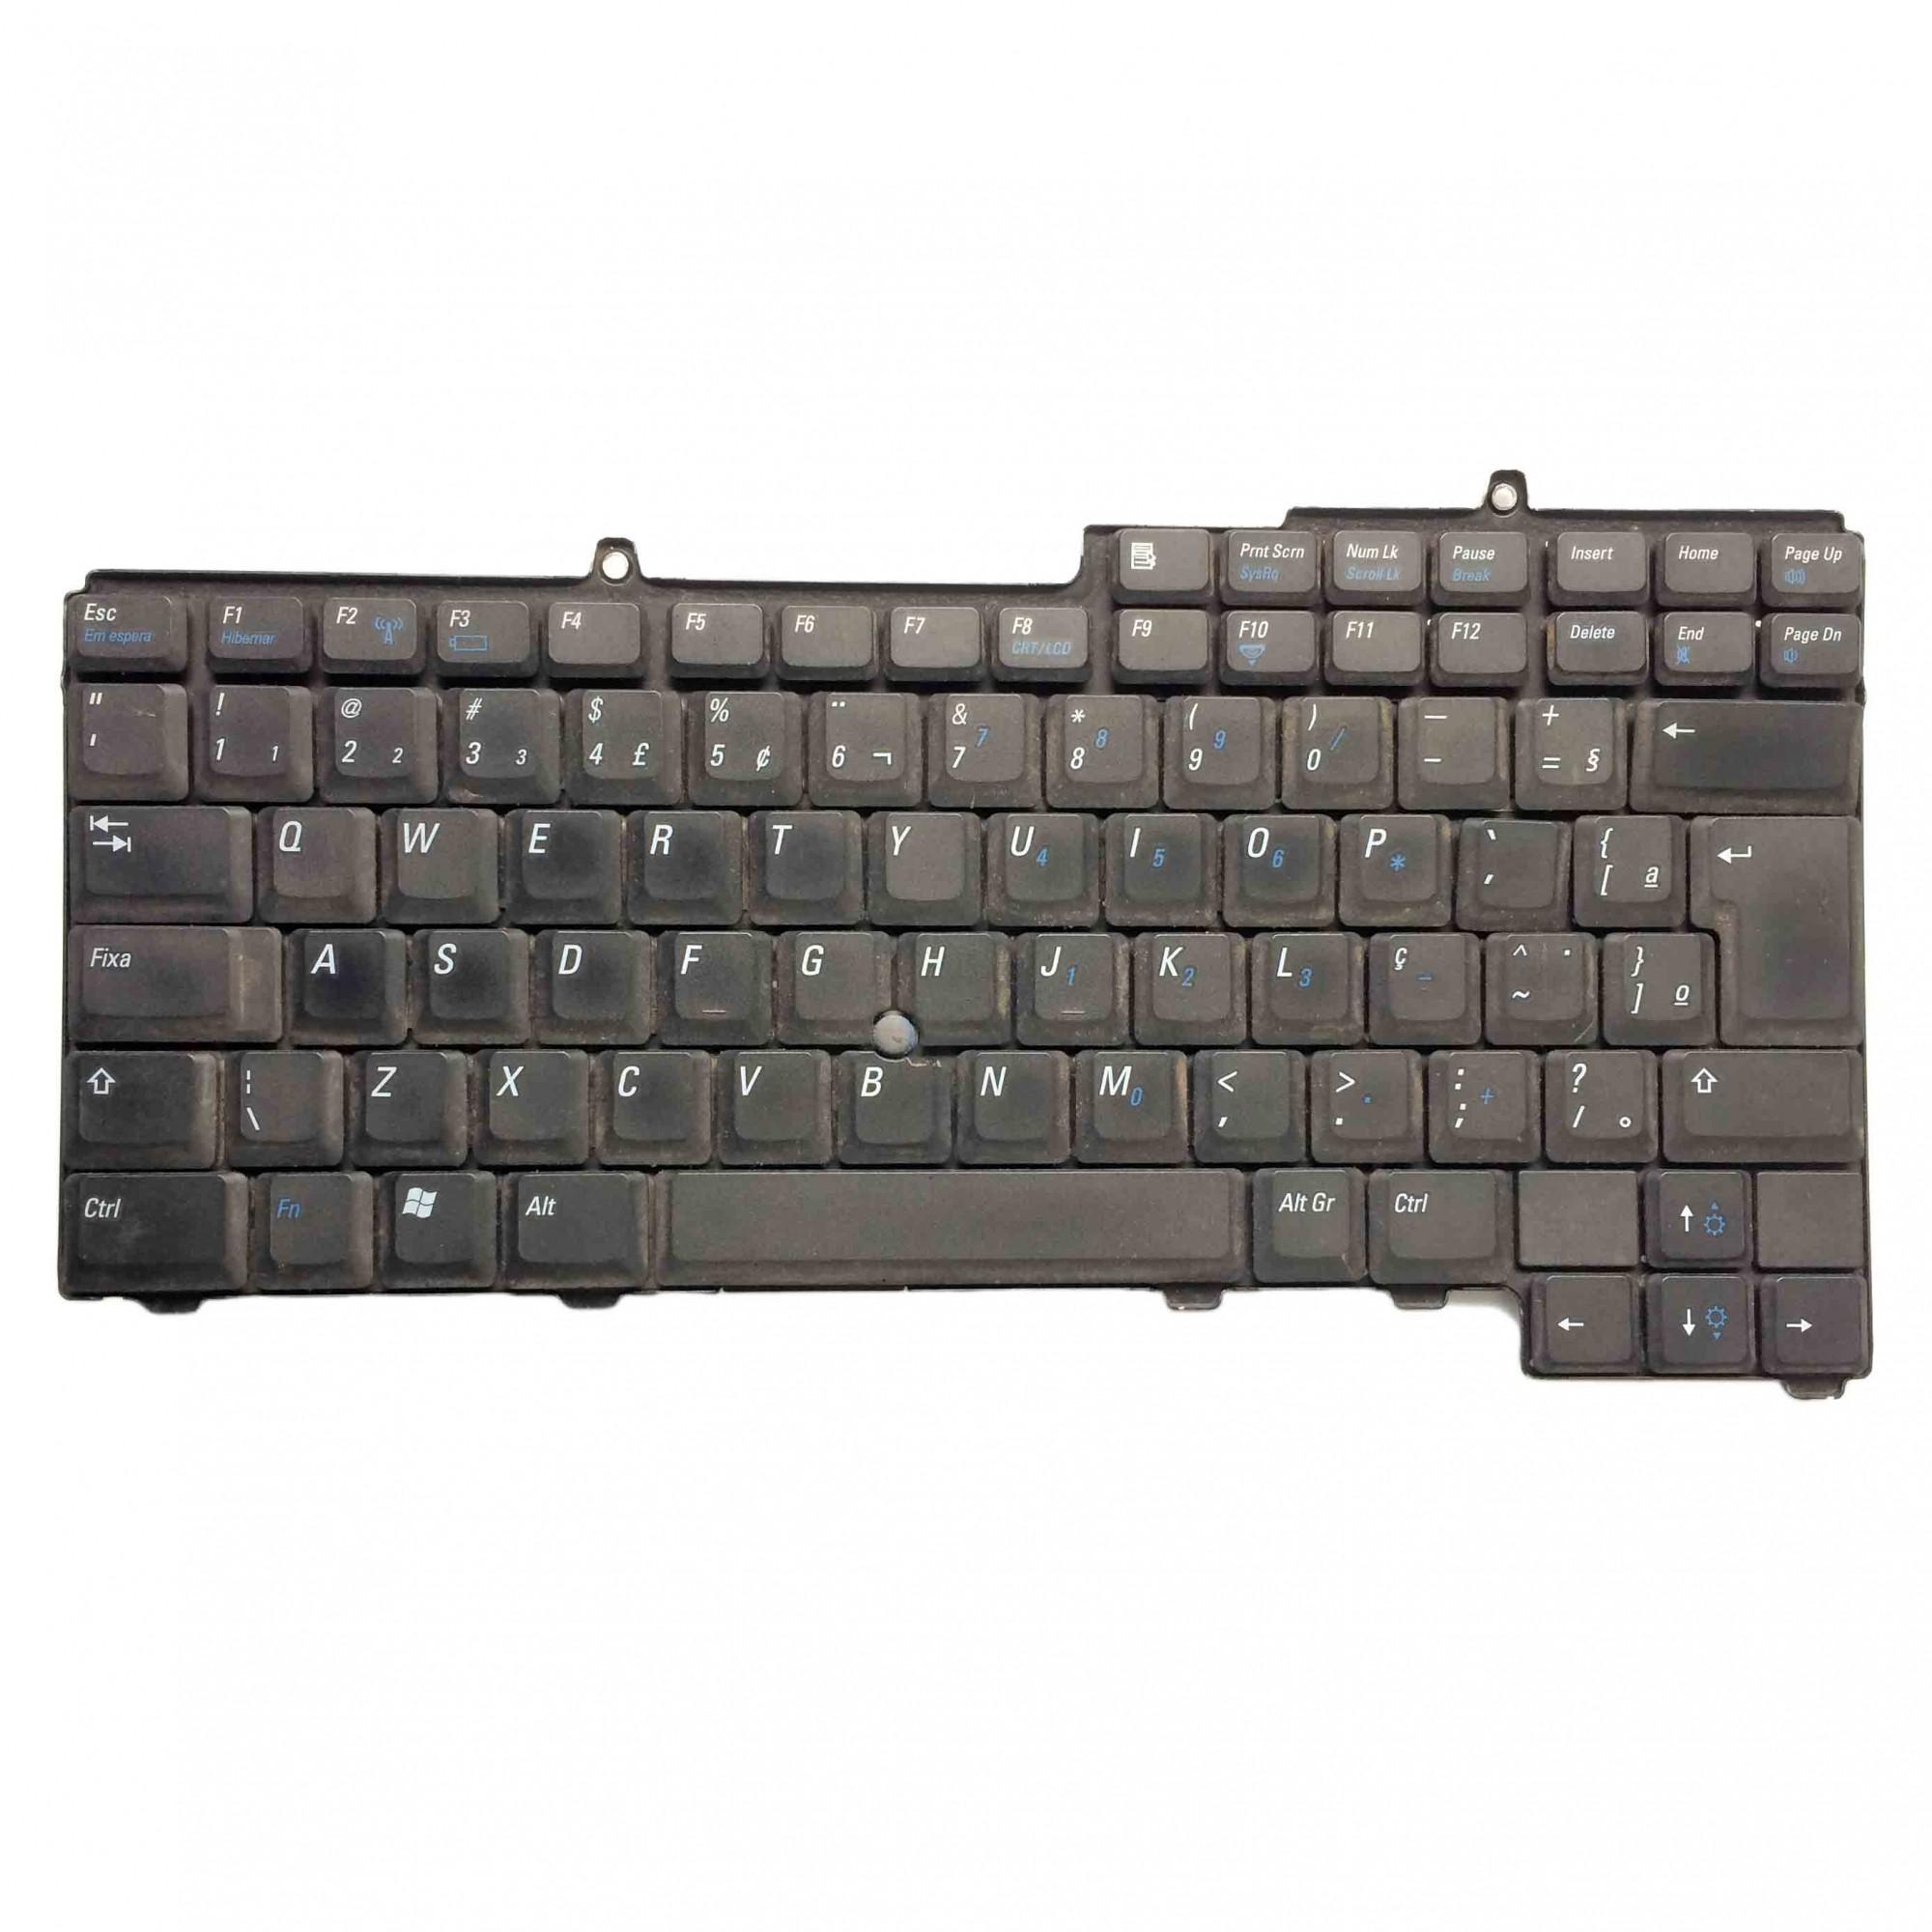 Teclado + Flat Notebook Dell Inspiron 1501 A245 Series 12v PN:kfrmb2 - Retirado